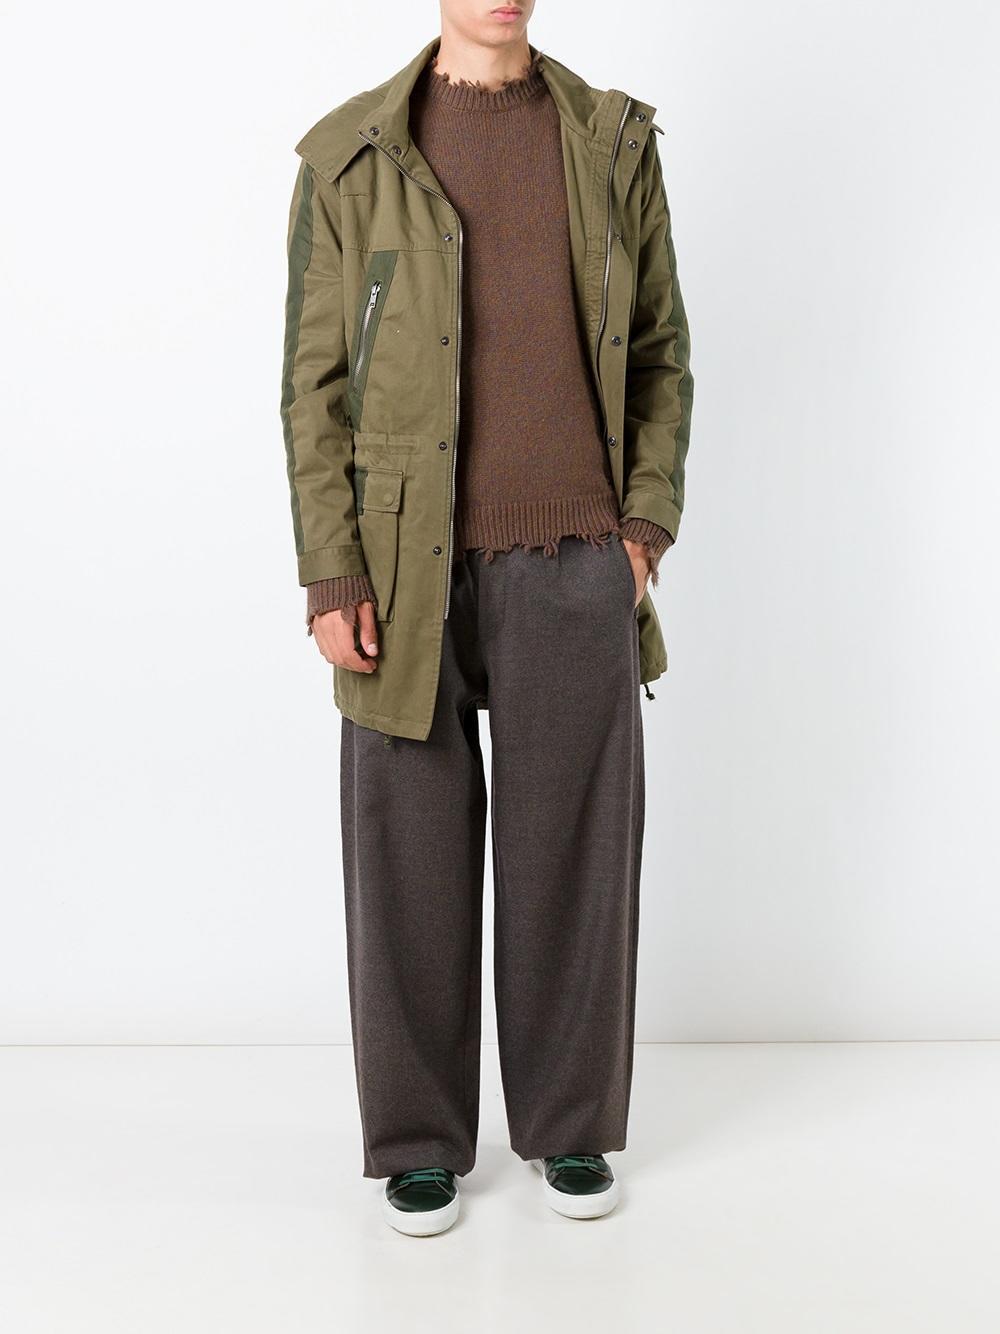 Dolce & Gabbana Wool Wide Leg Trousers in Brown for Men